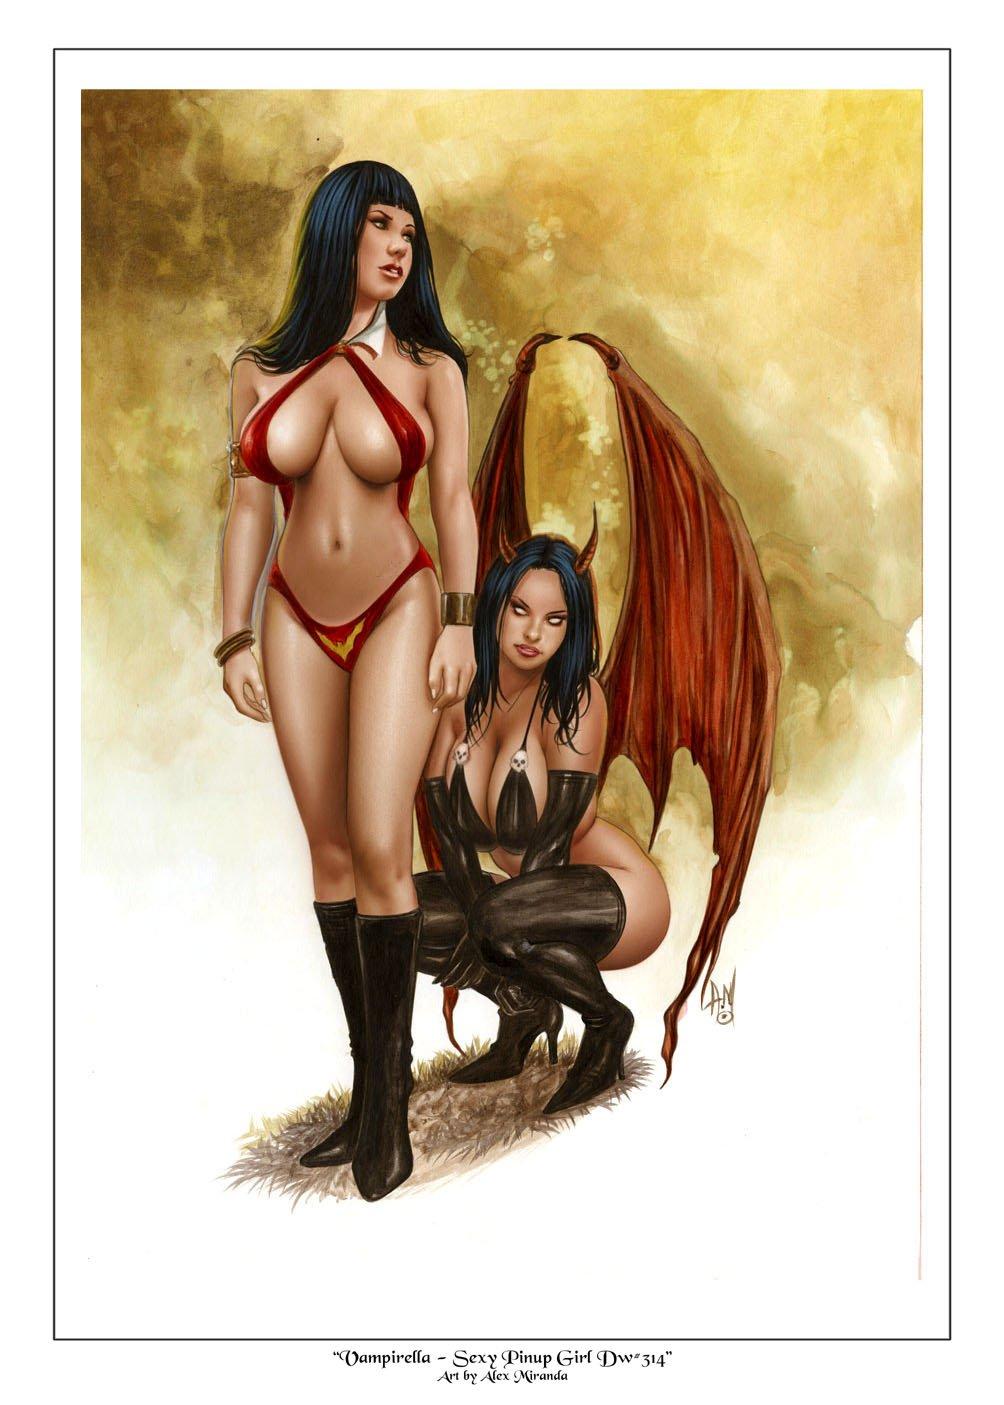 Hot  Vampirella   Dw#314 - Fantasy Pinup Girl Print